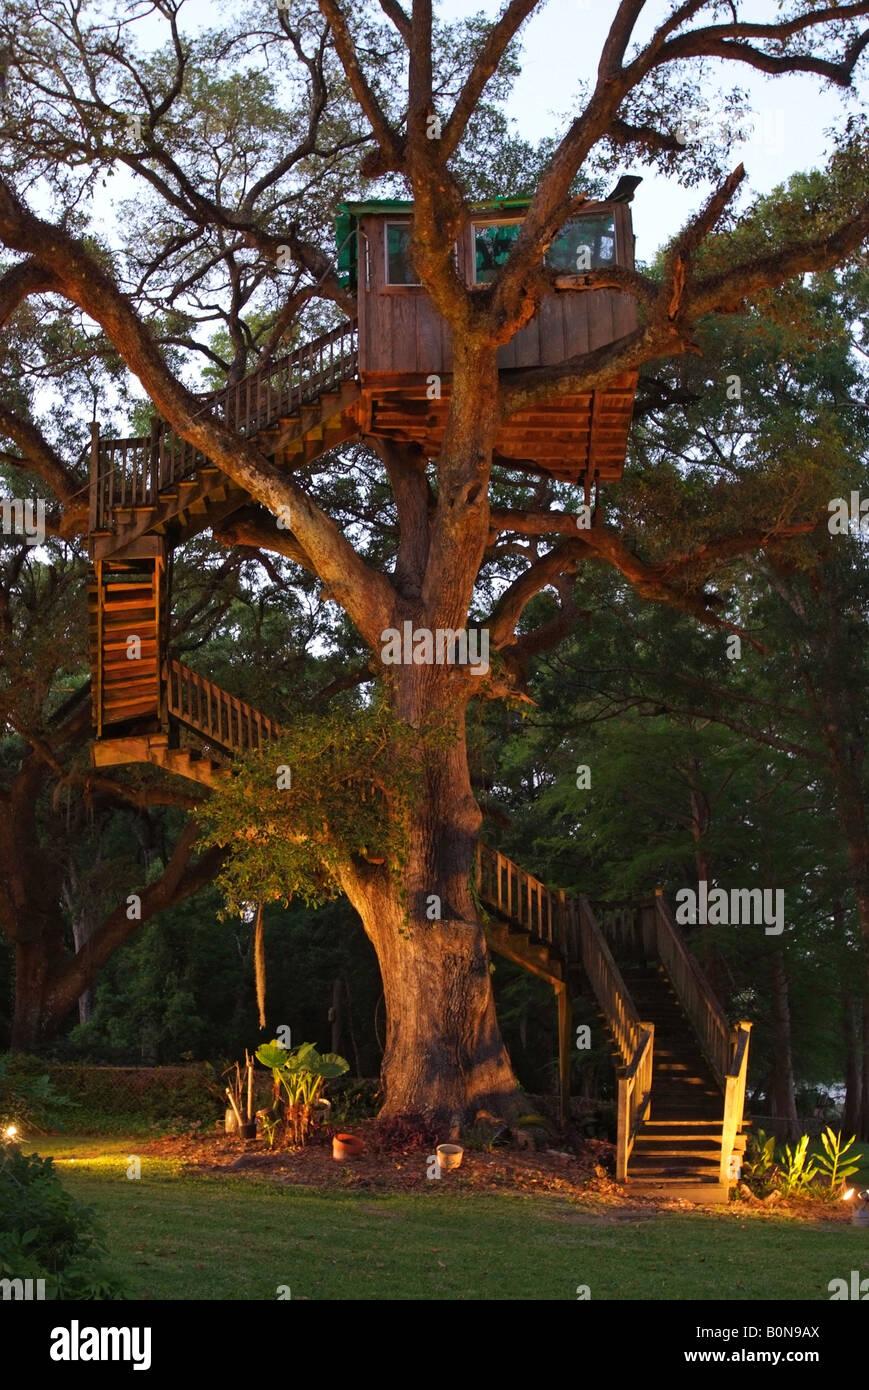 large-treehouse-in-an-old-oak-tree-in-st